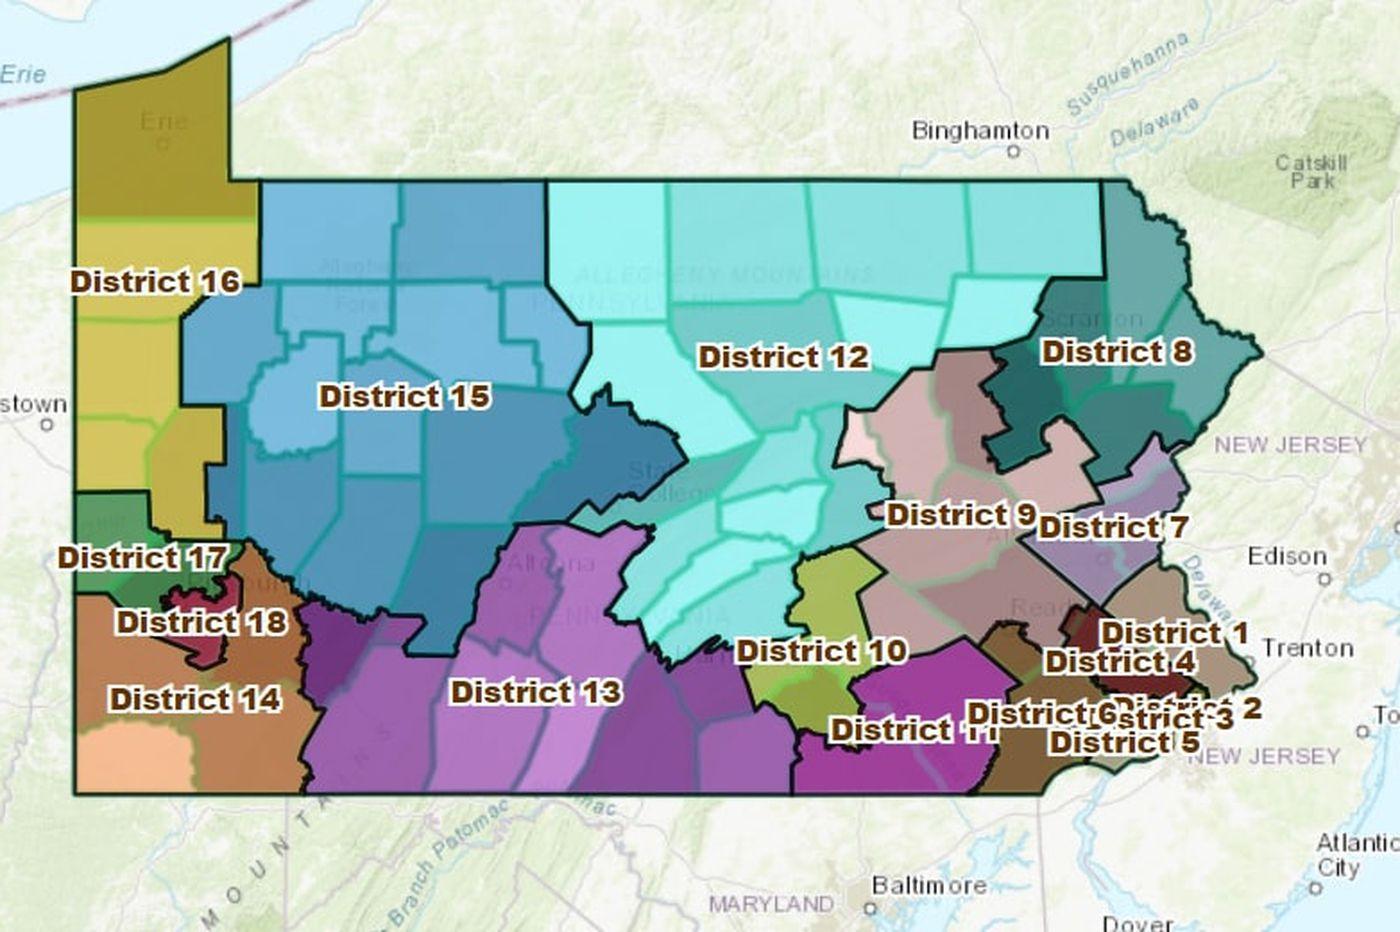 Win cash prizes! Draw Pennsylvania's congressional map